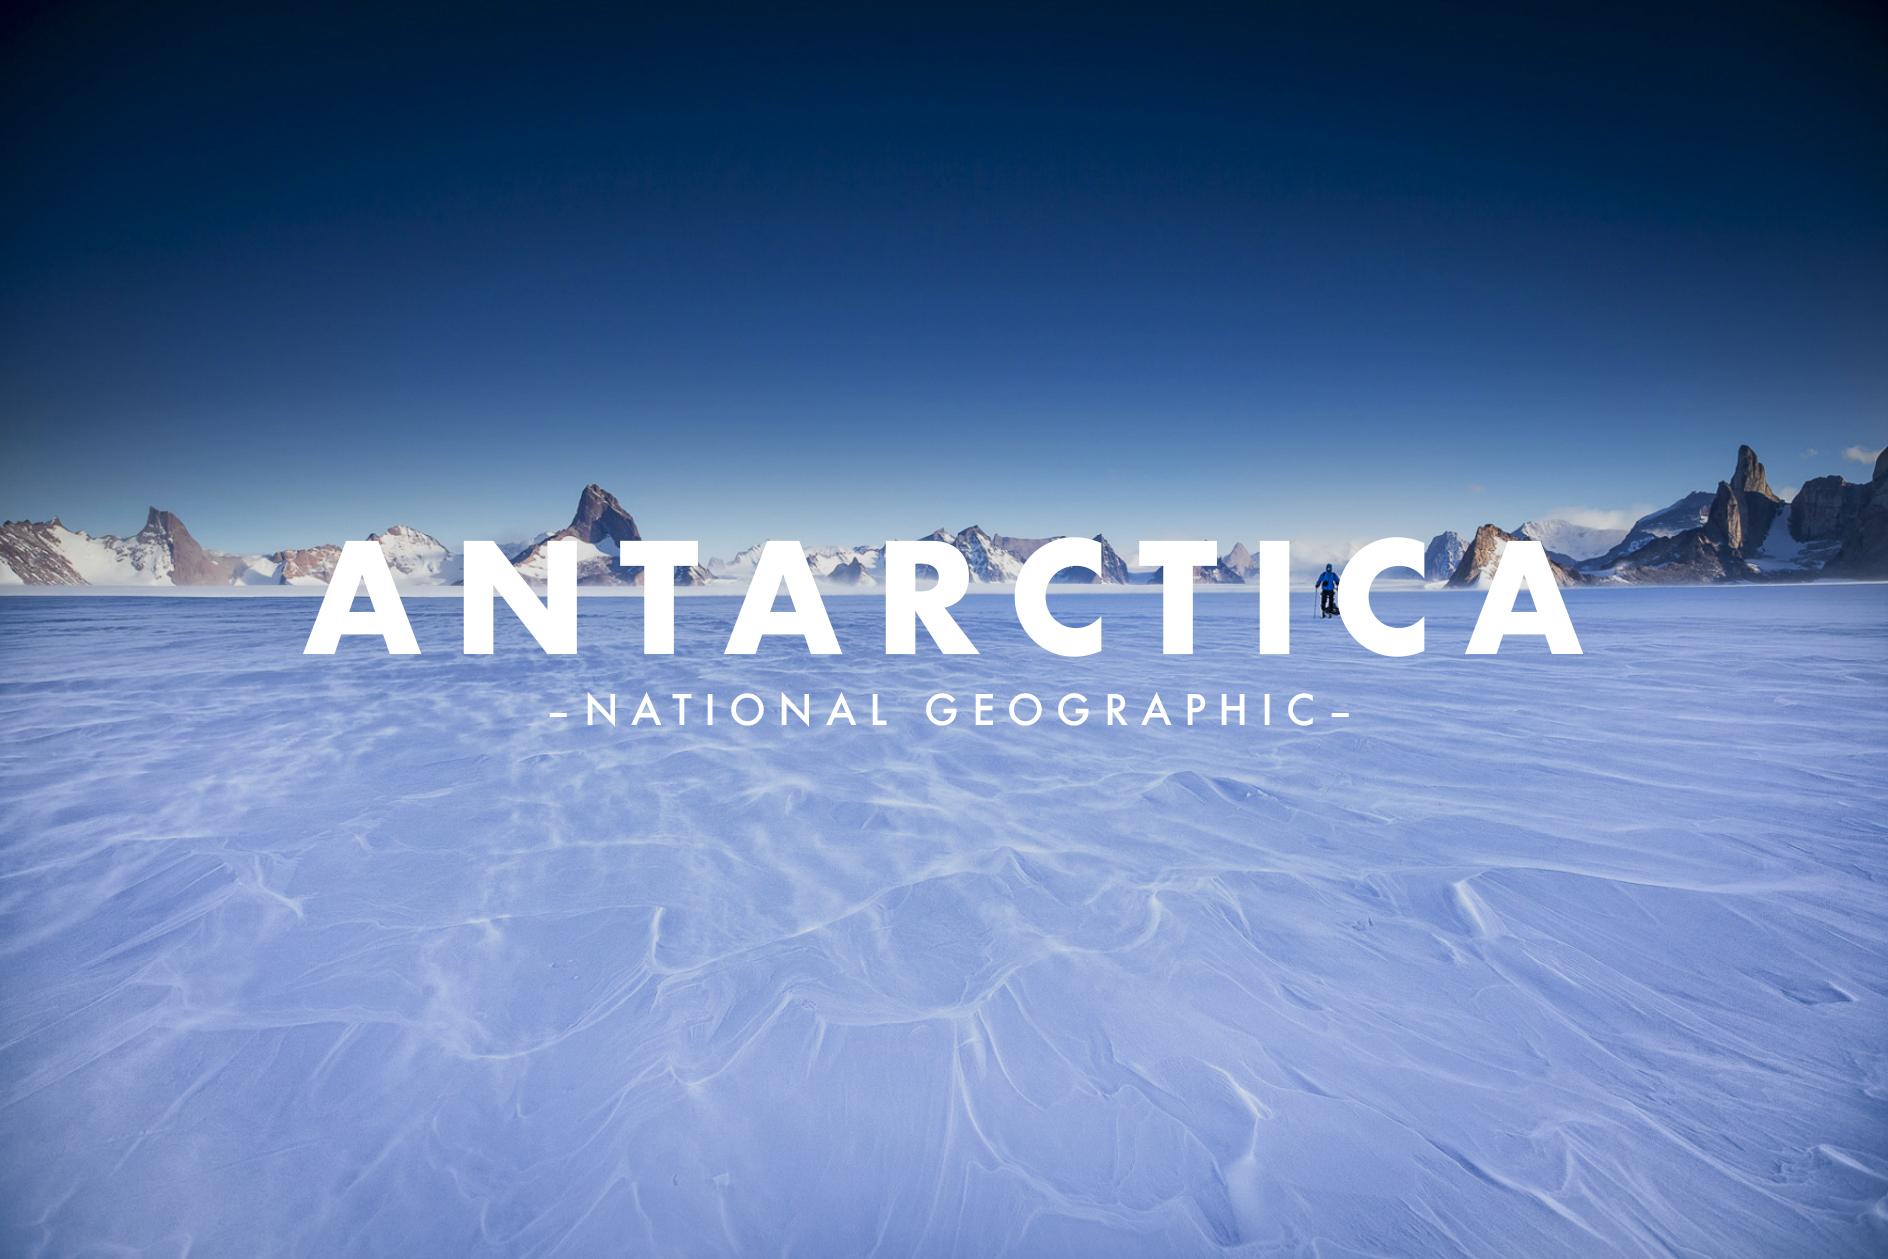 Cory-Richards-Photographer-Antarctica-1-1.jpg